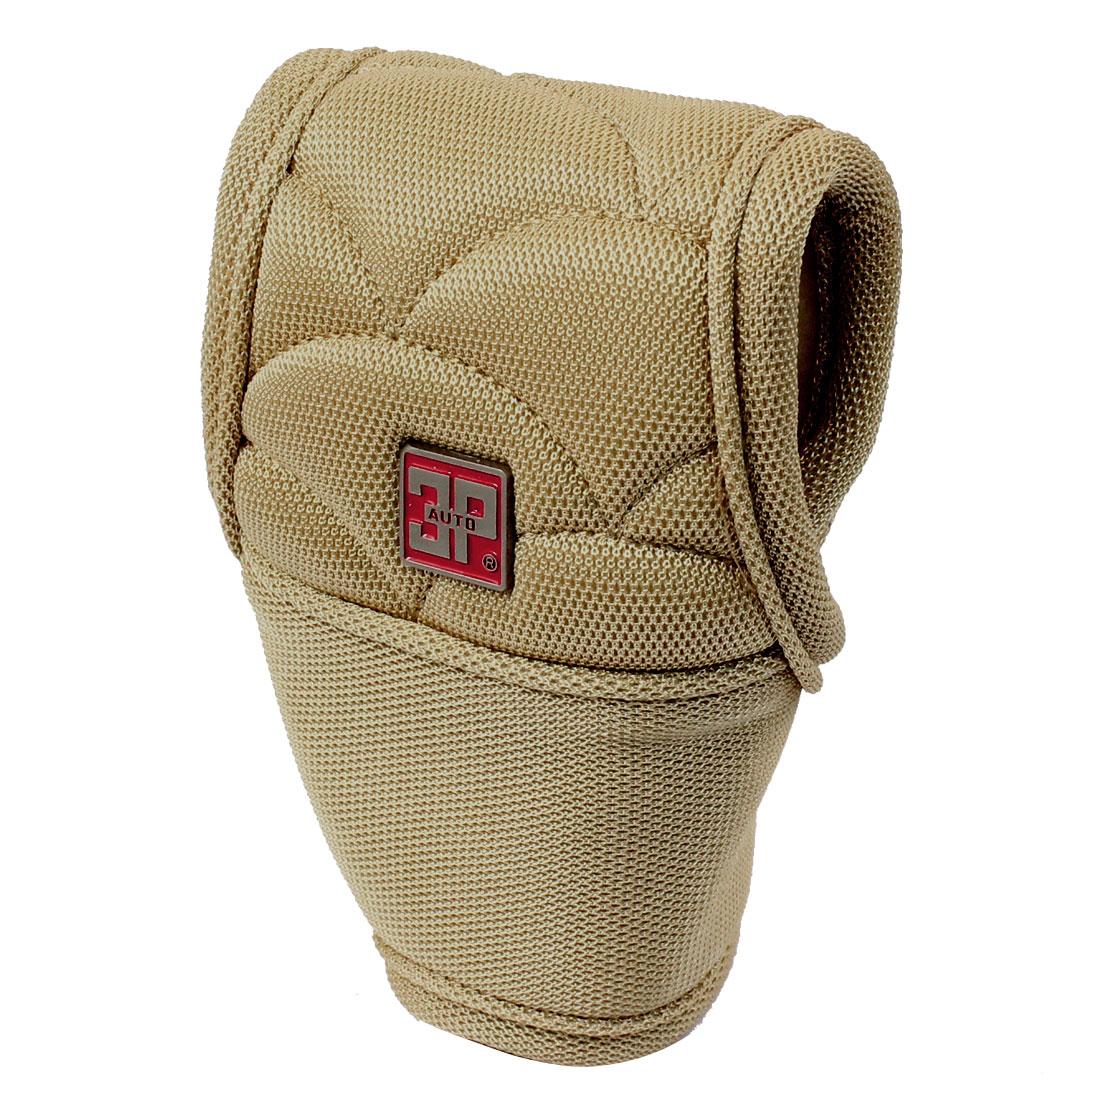 Car Light Brown Nylon Detachable Closure Shift Gear Knob Cover Guard Protector